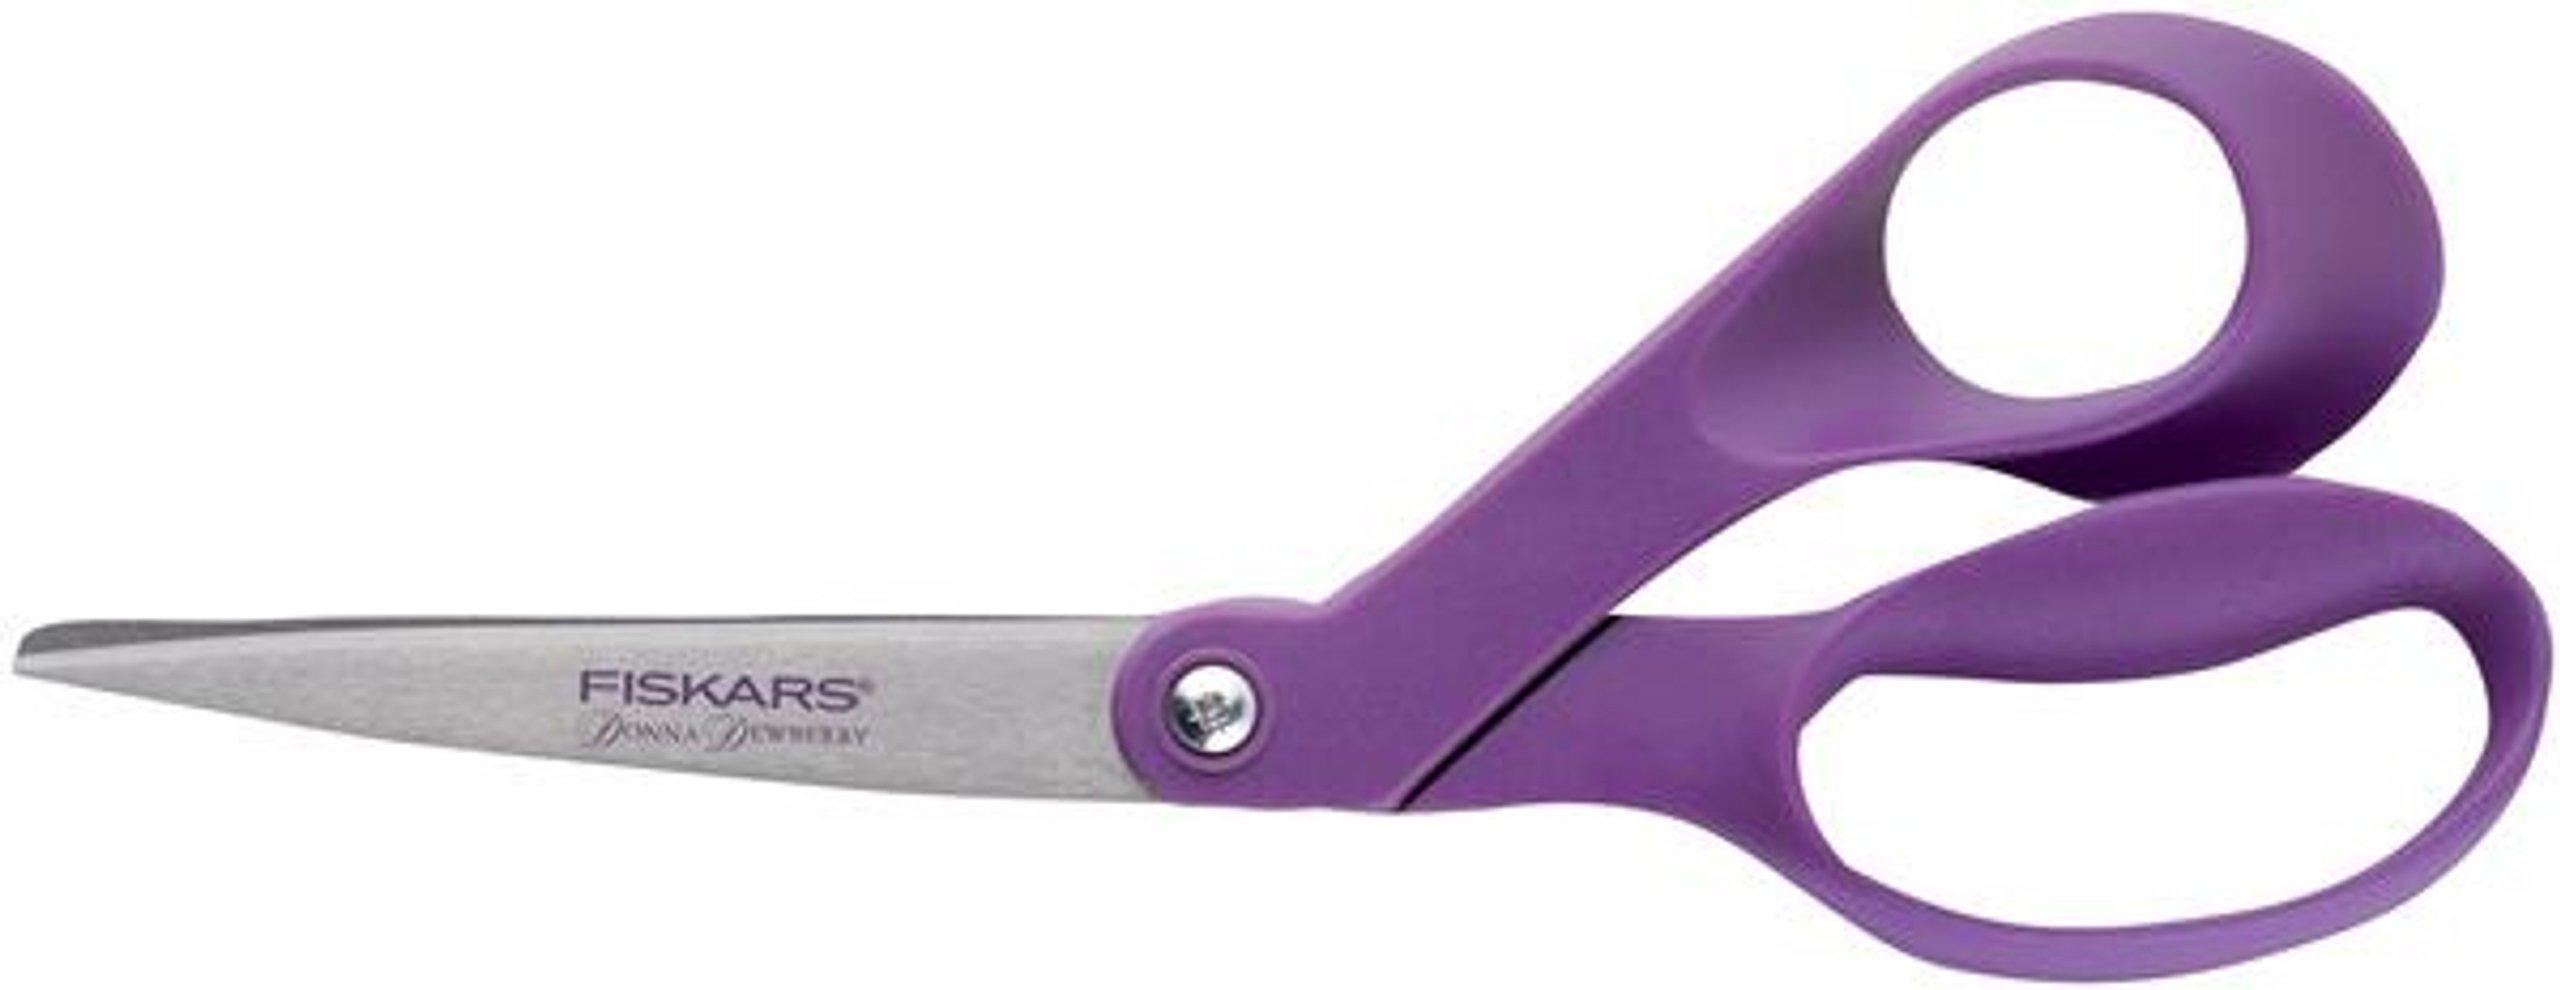 Fiskars 8-Inch Donna Dewberry Collection Classic Bent Scissors